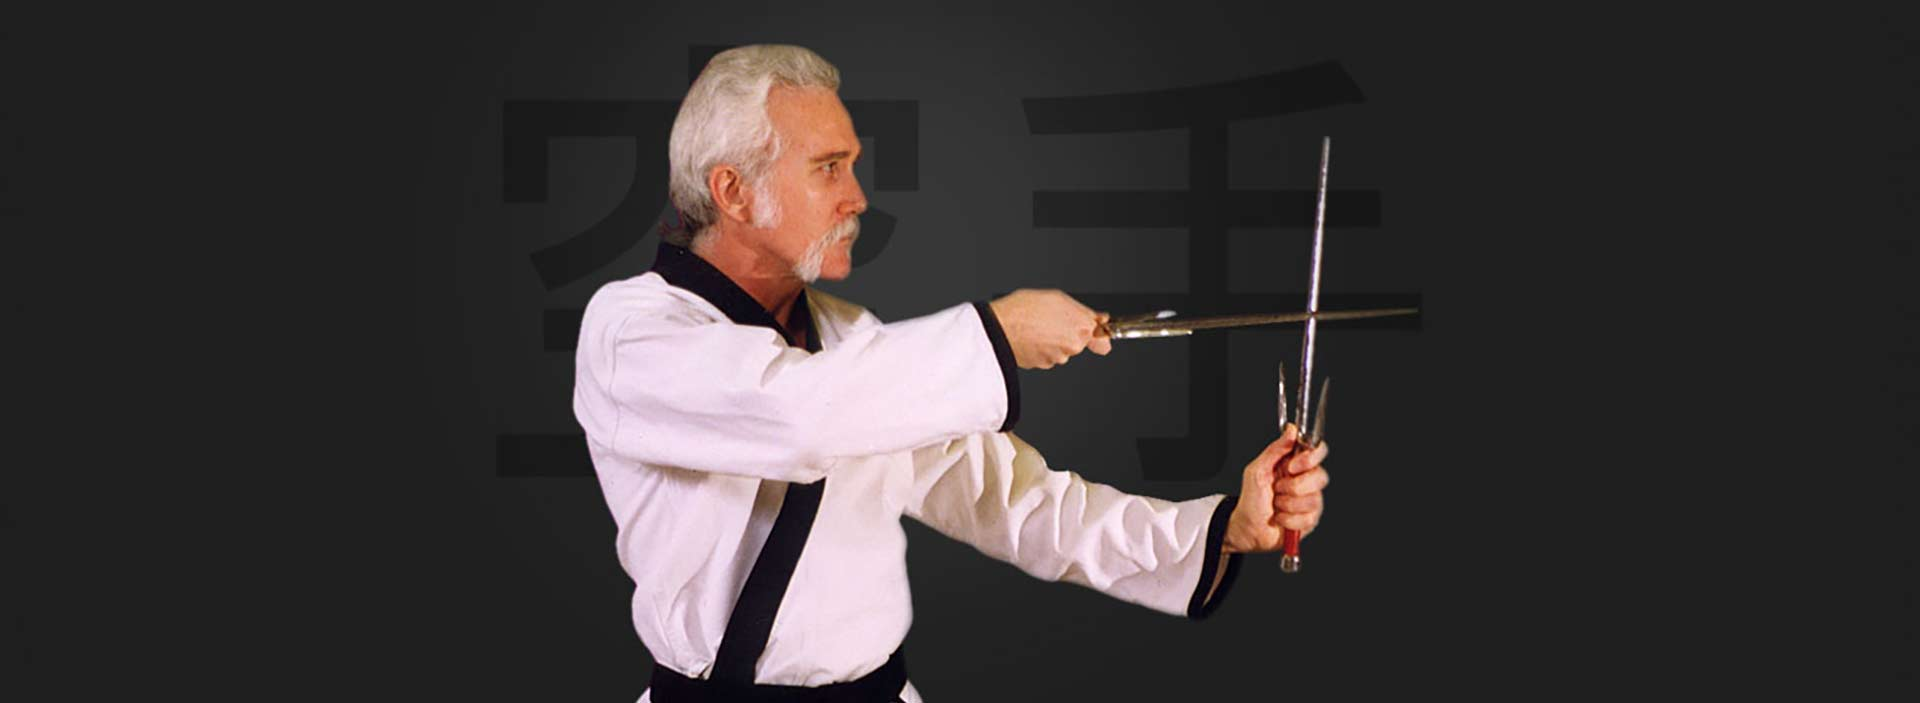 Master Michael Ellison